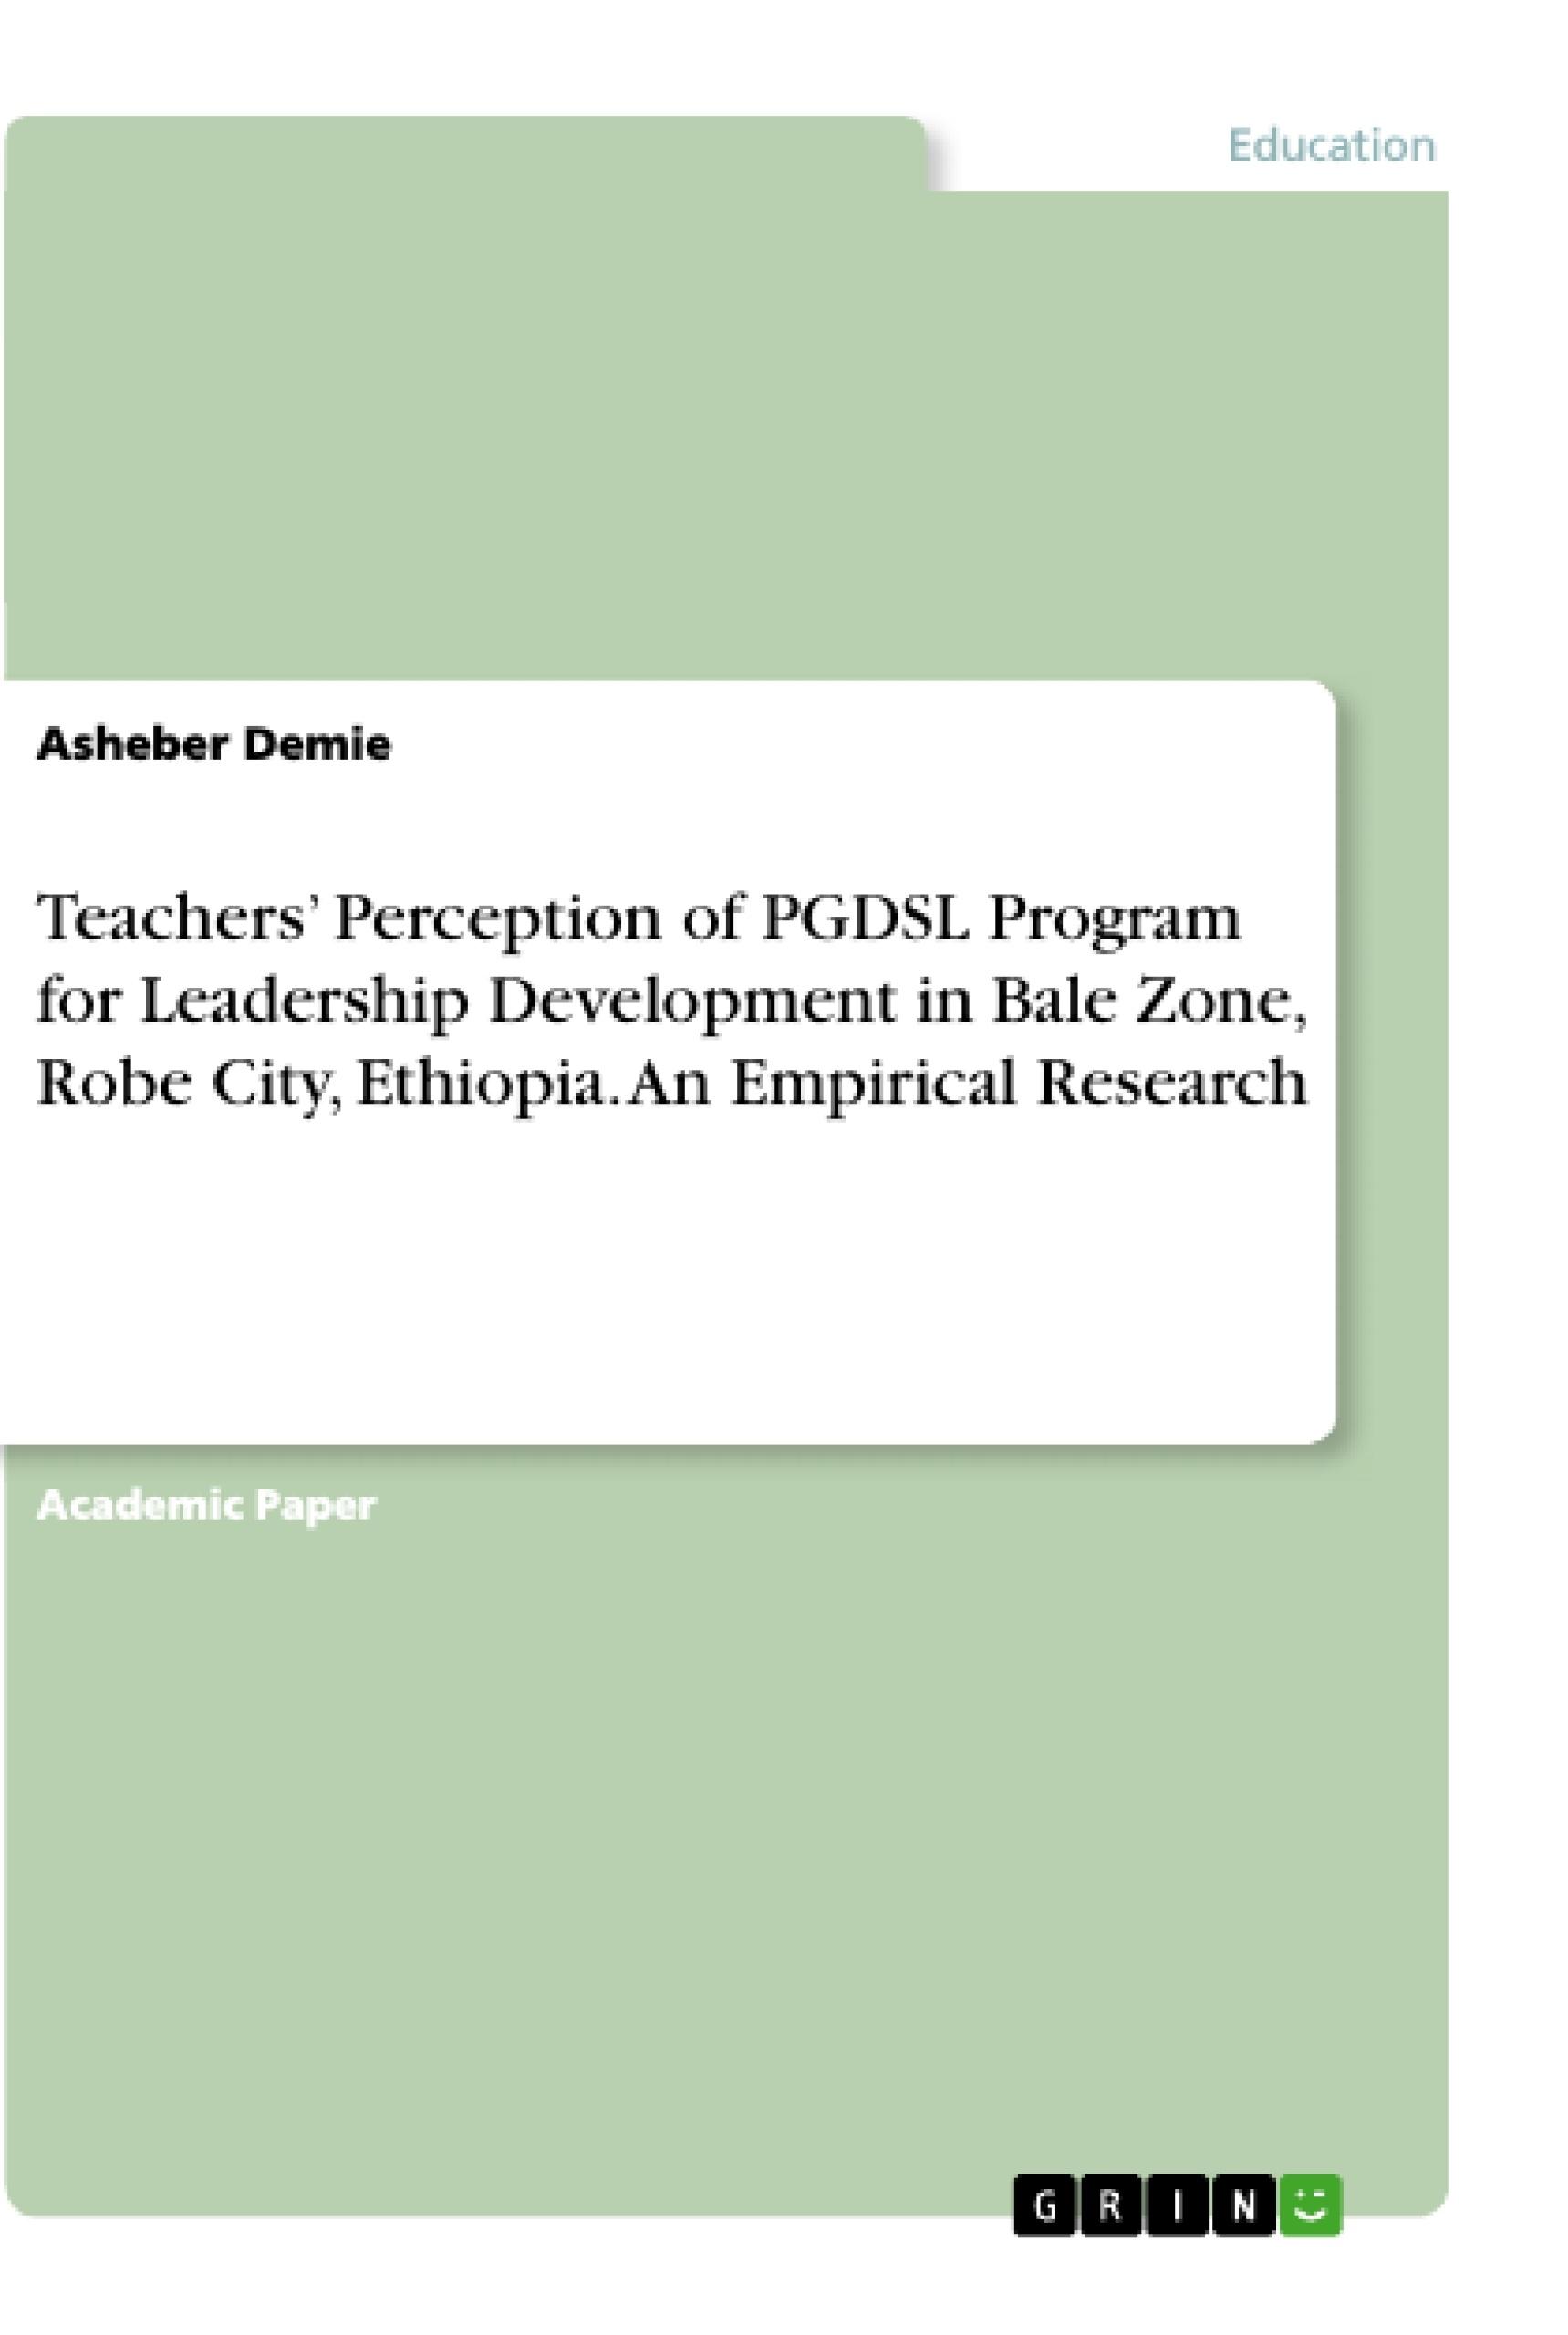 Title: Teachers' Perception of PGDSL Program for Leadership Development in Bale Zone, Robe City, Ethiopia. An Empirical Research